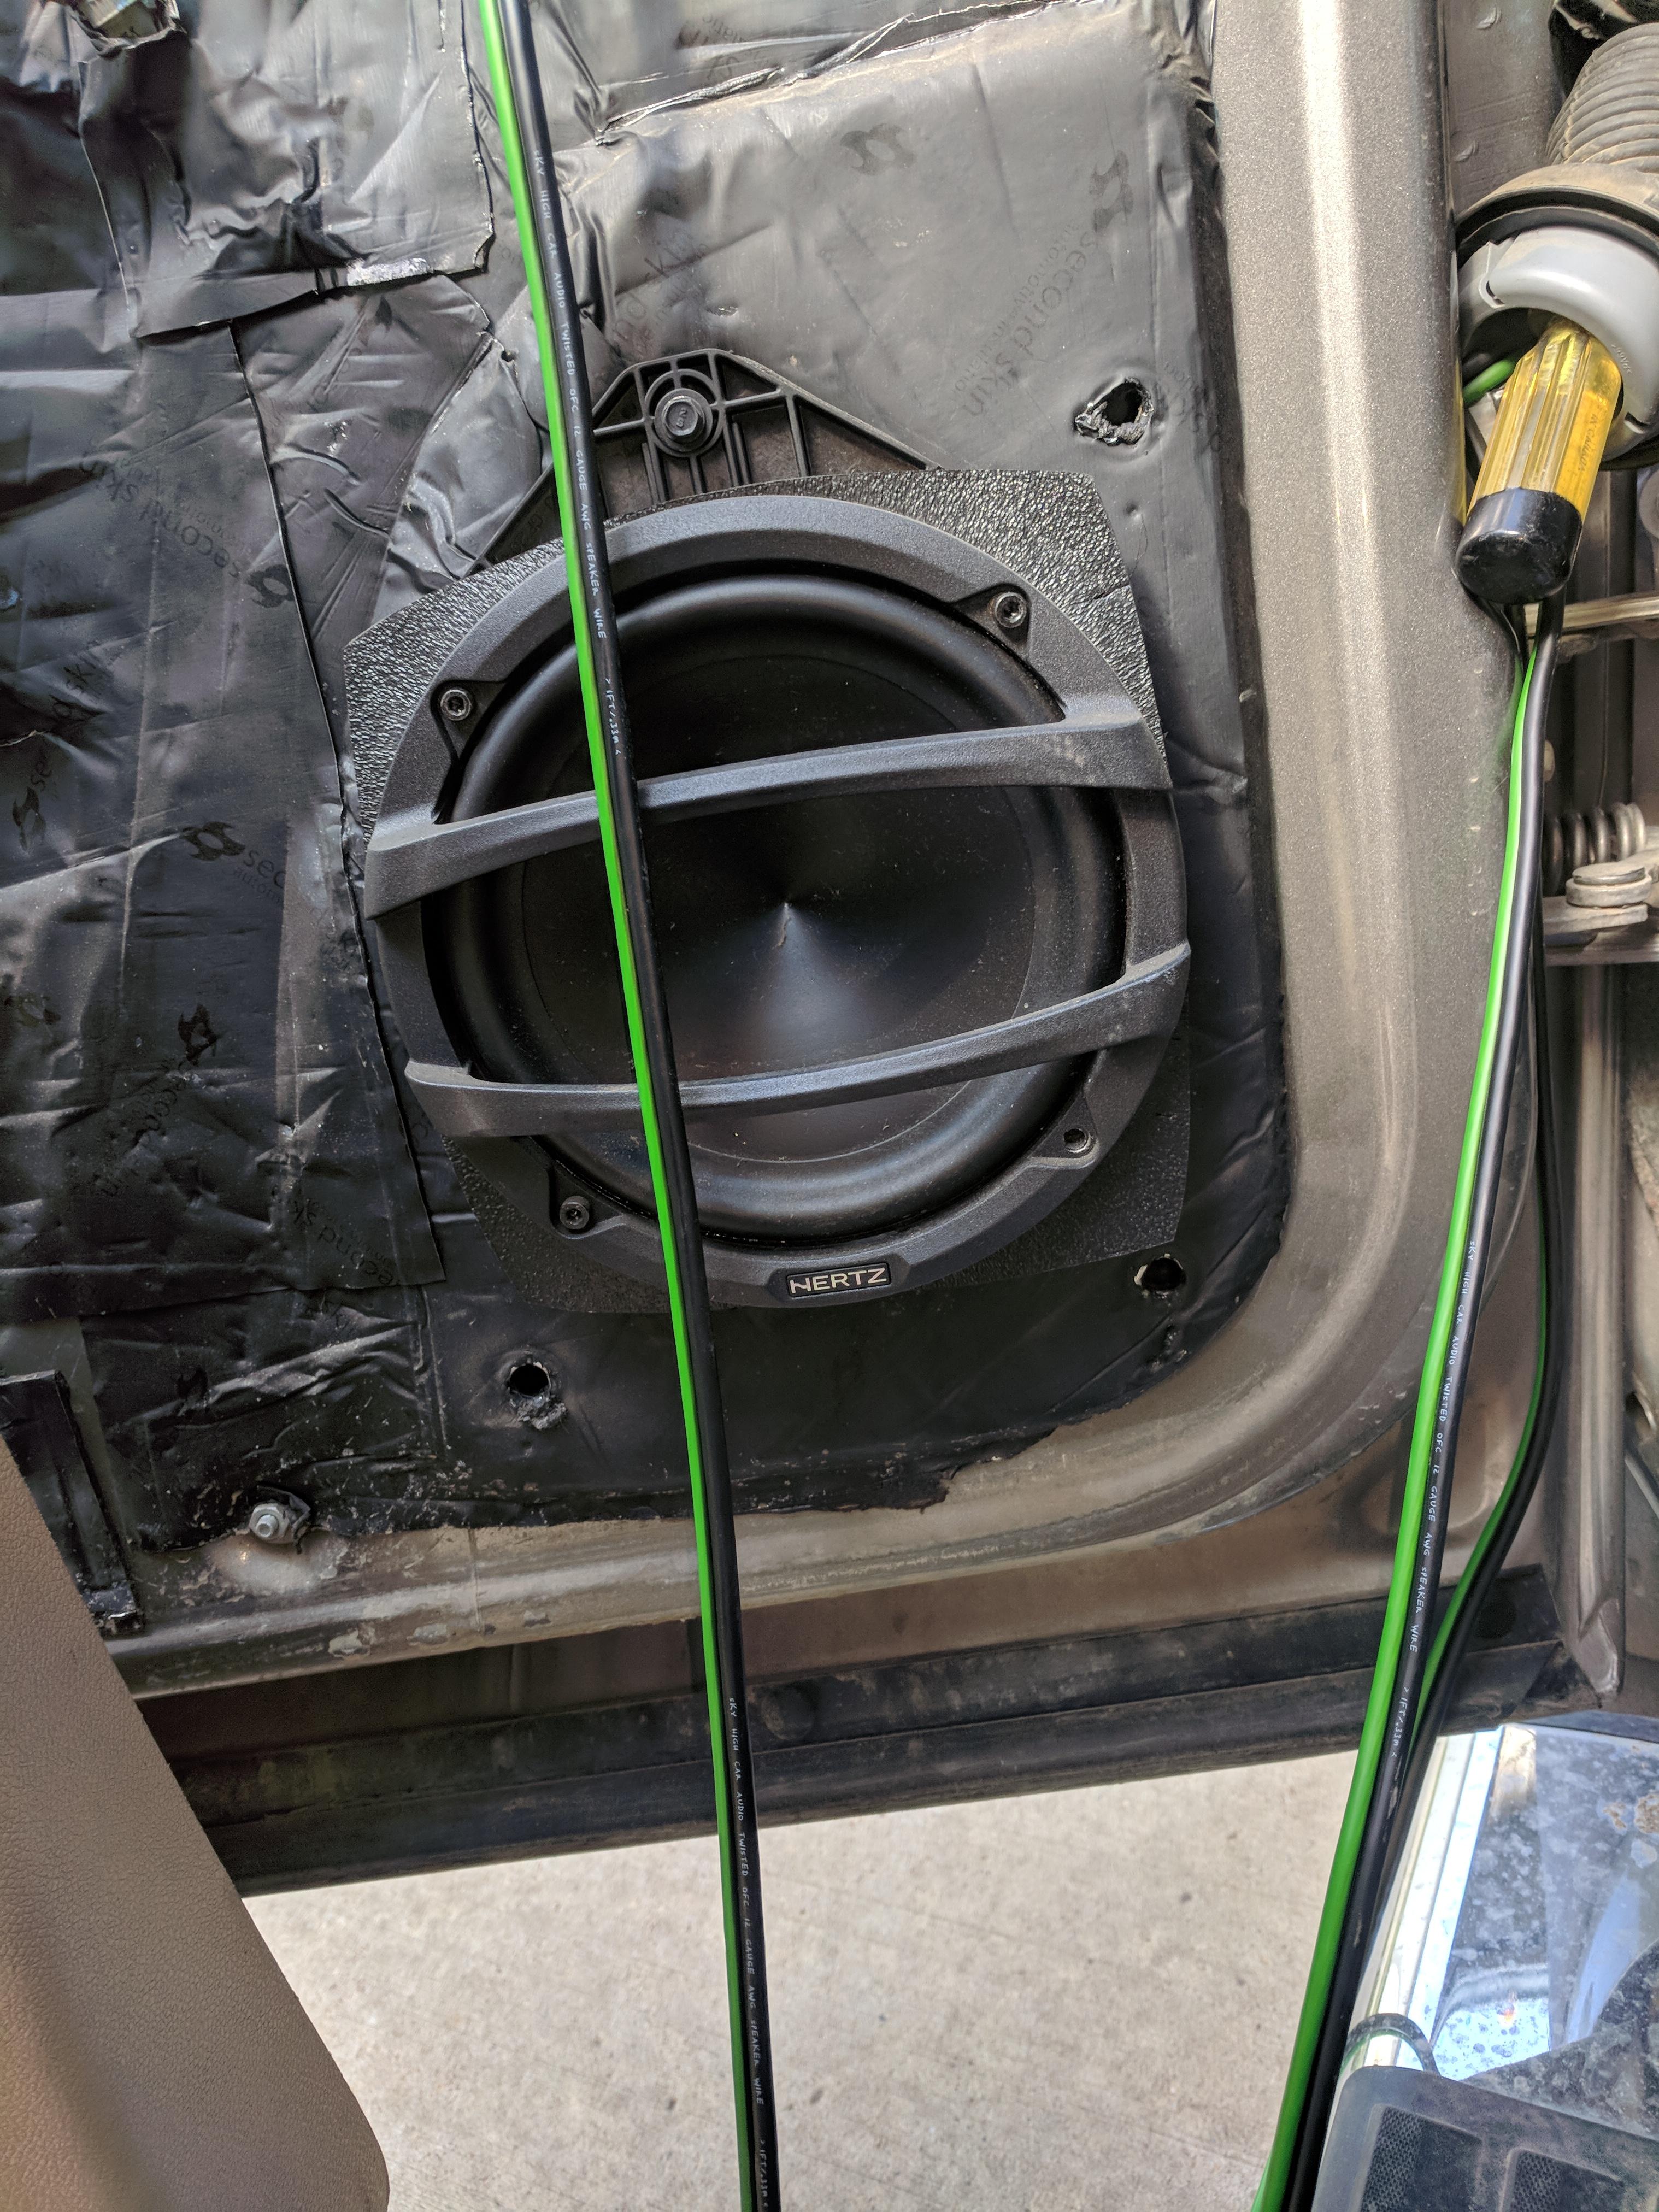 First Ever System Build Daily Driver Macks Murder Bass Denali Mack Audio Wiring Img 20180601 173752